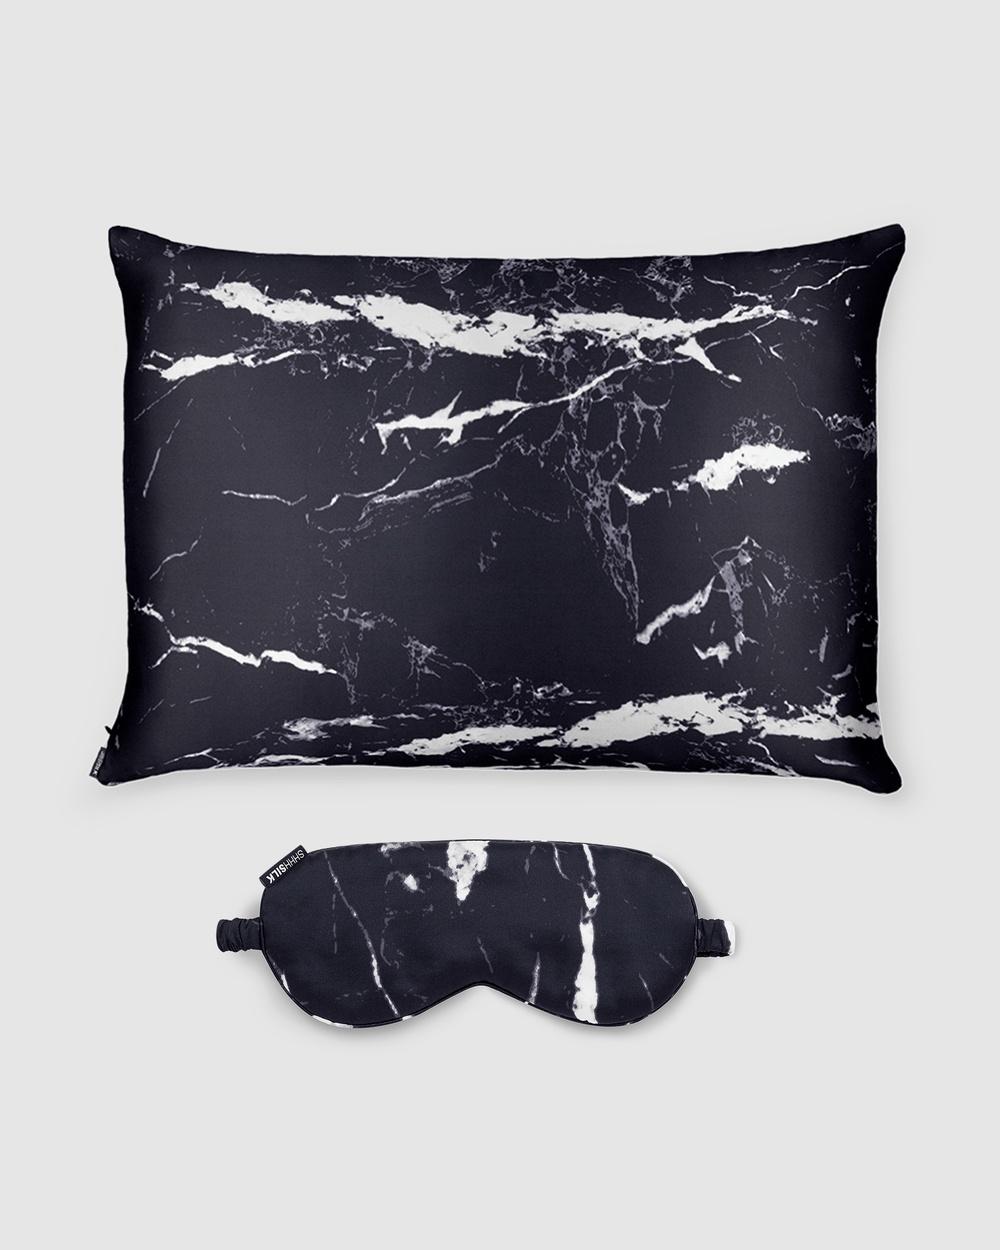 Shhh Silk Eye Mask and Pillowcase Sleep Black Marble